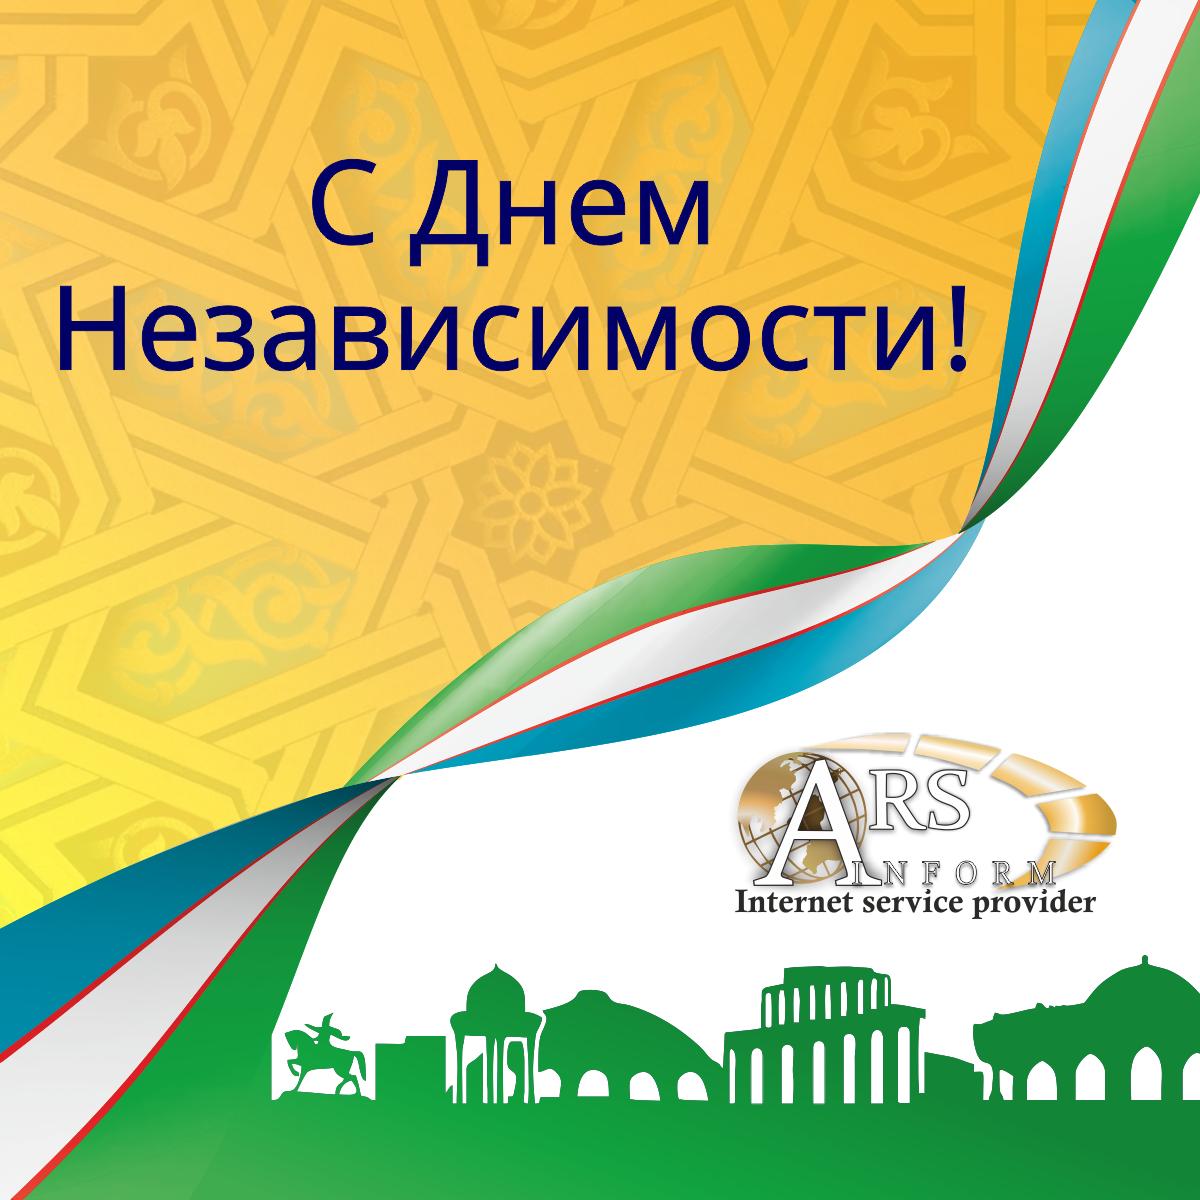 Поздравляем с Днём Независимости Узбекистана!